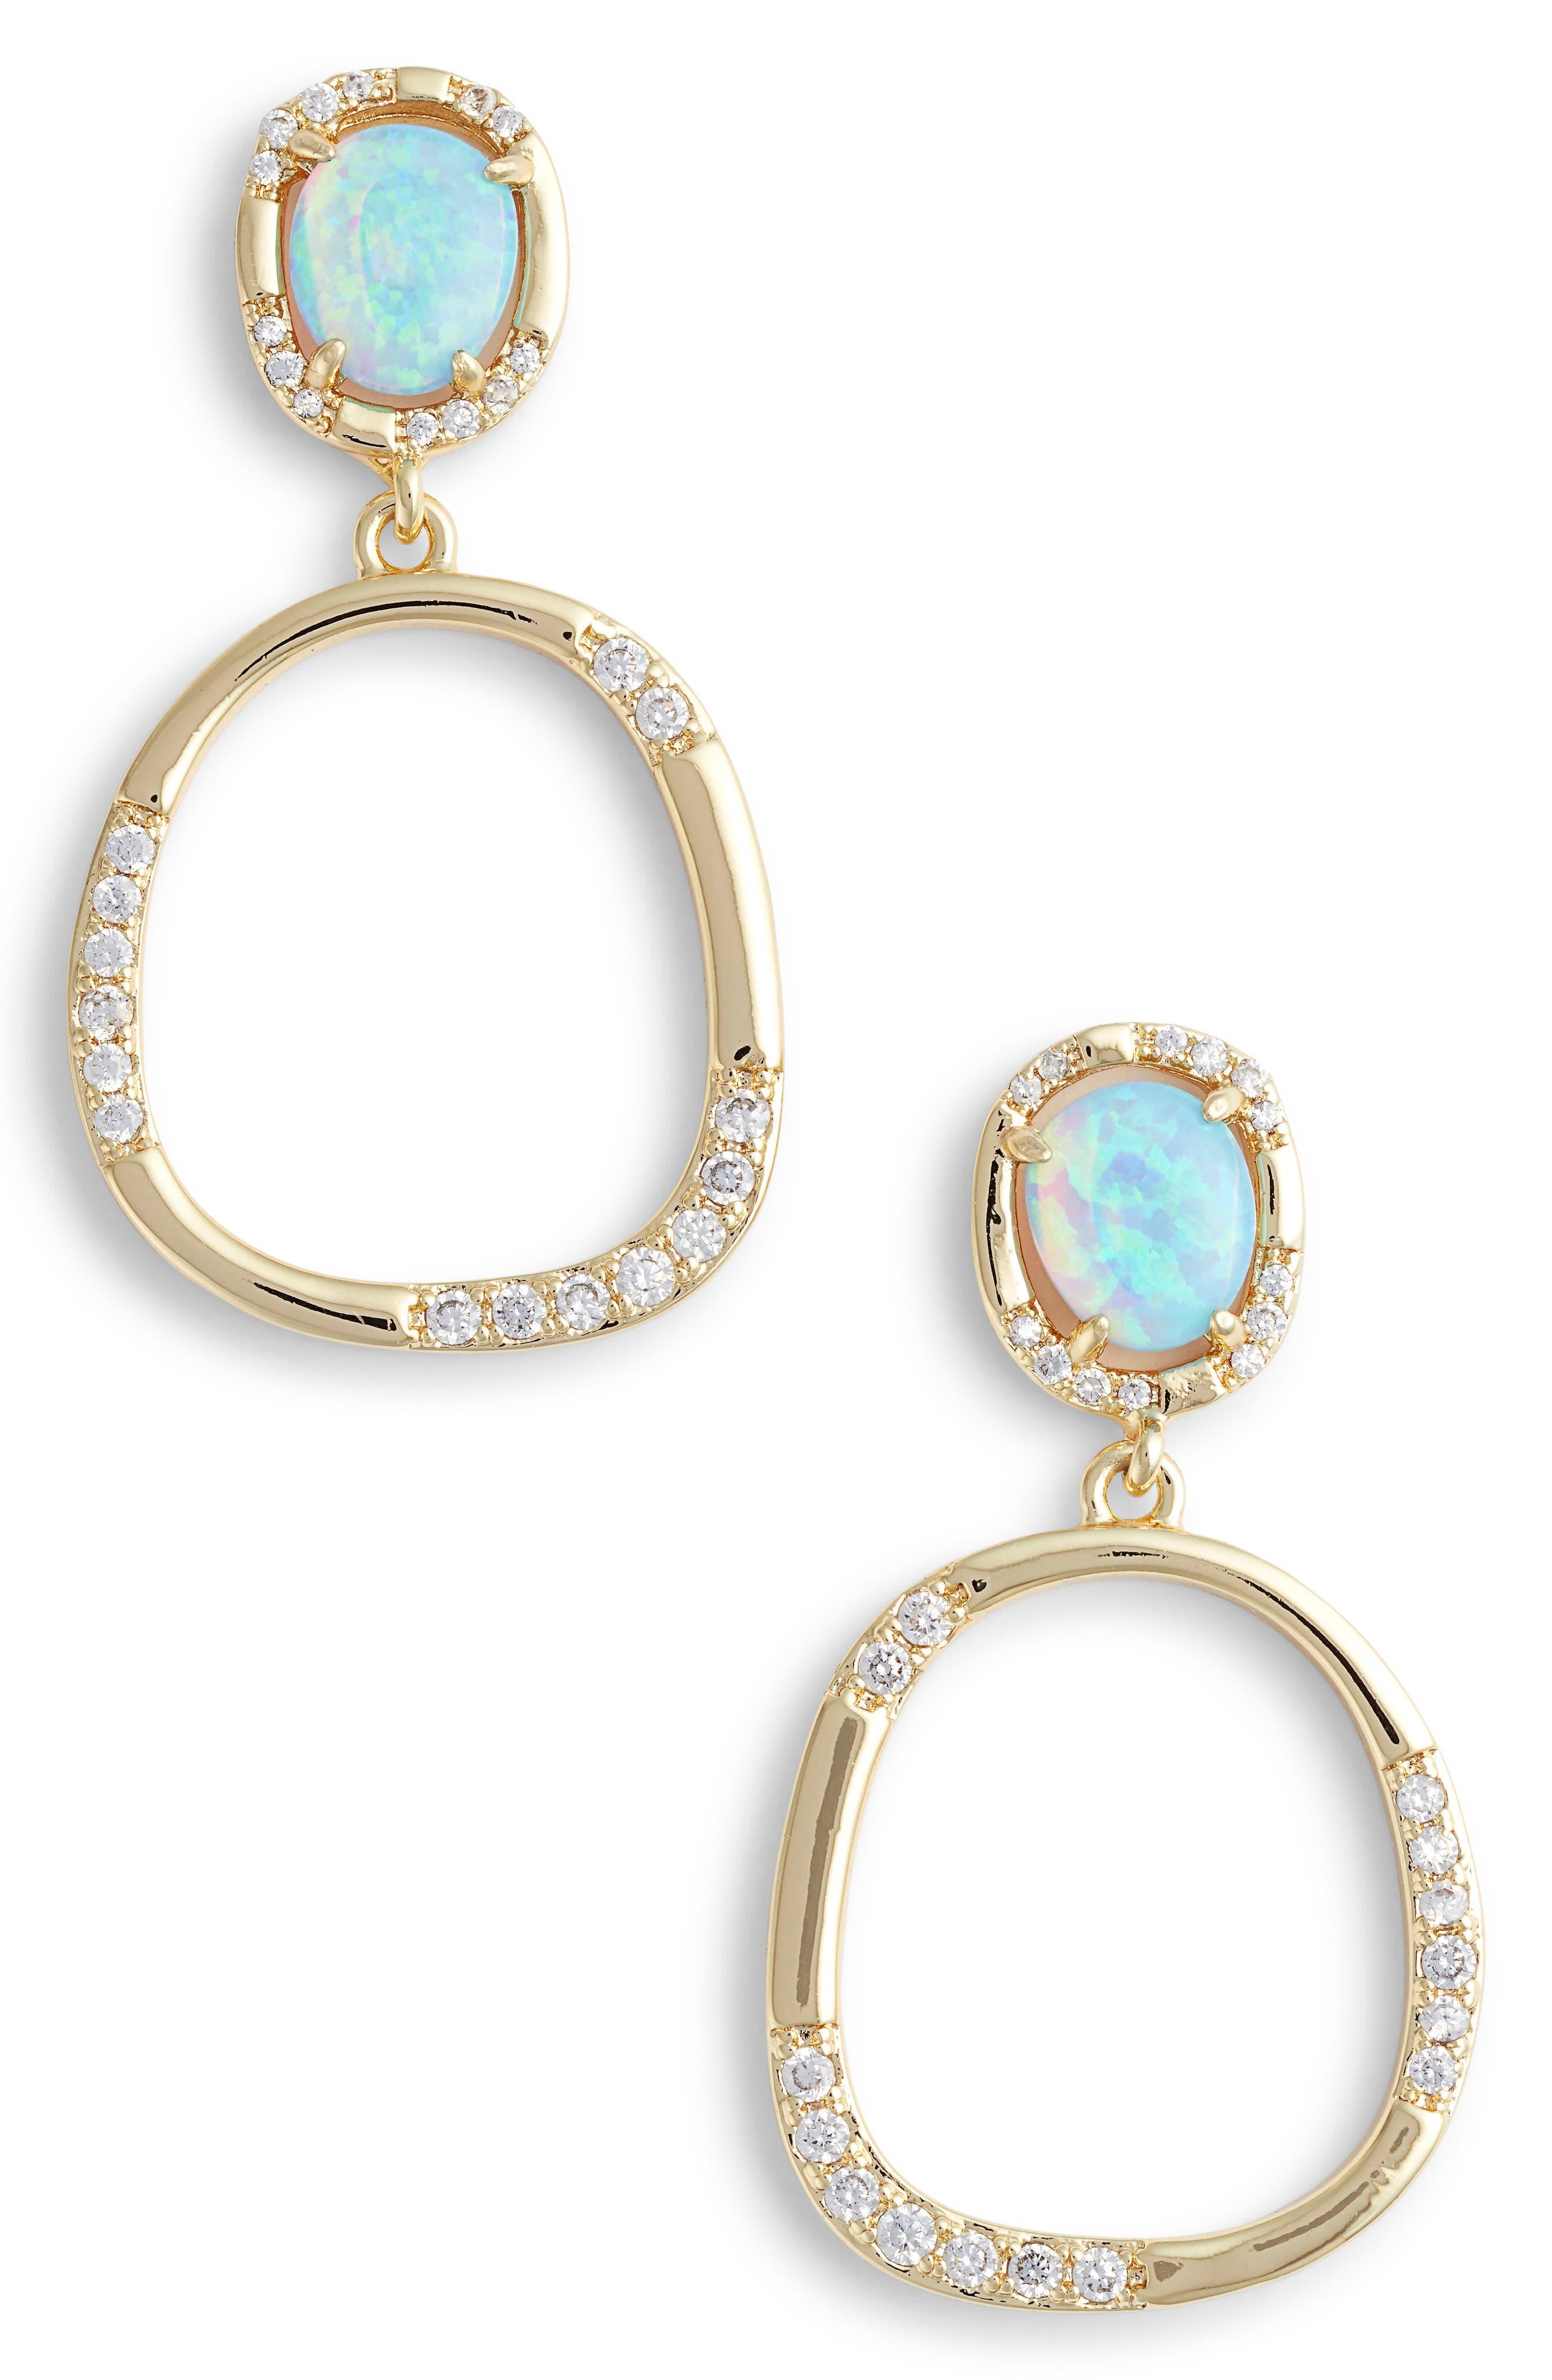 Luna Opal Drop Earrings,                             Main thumbnail 1, color,                             Opal/ Crystal